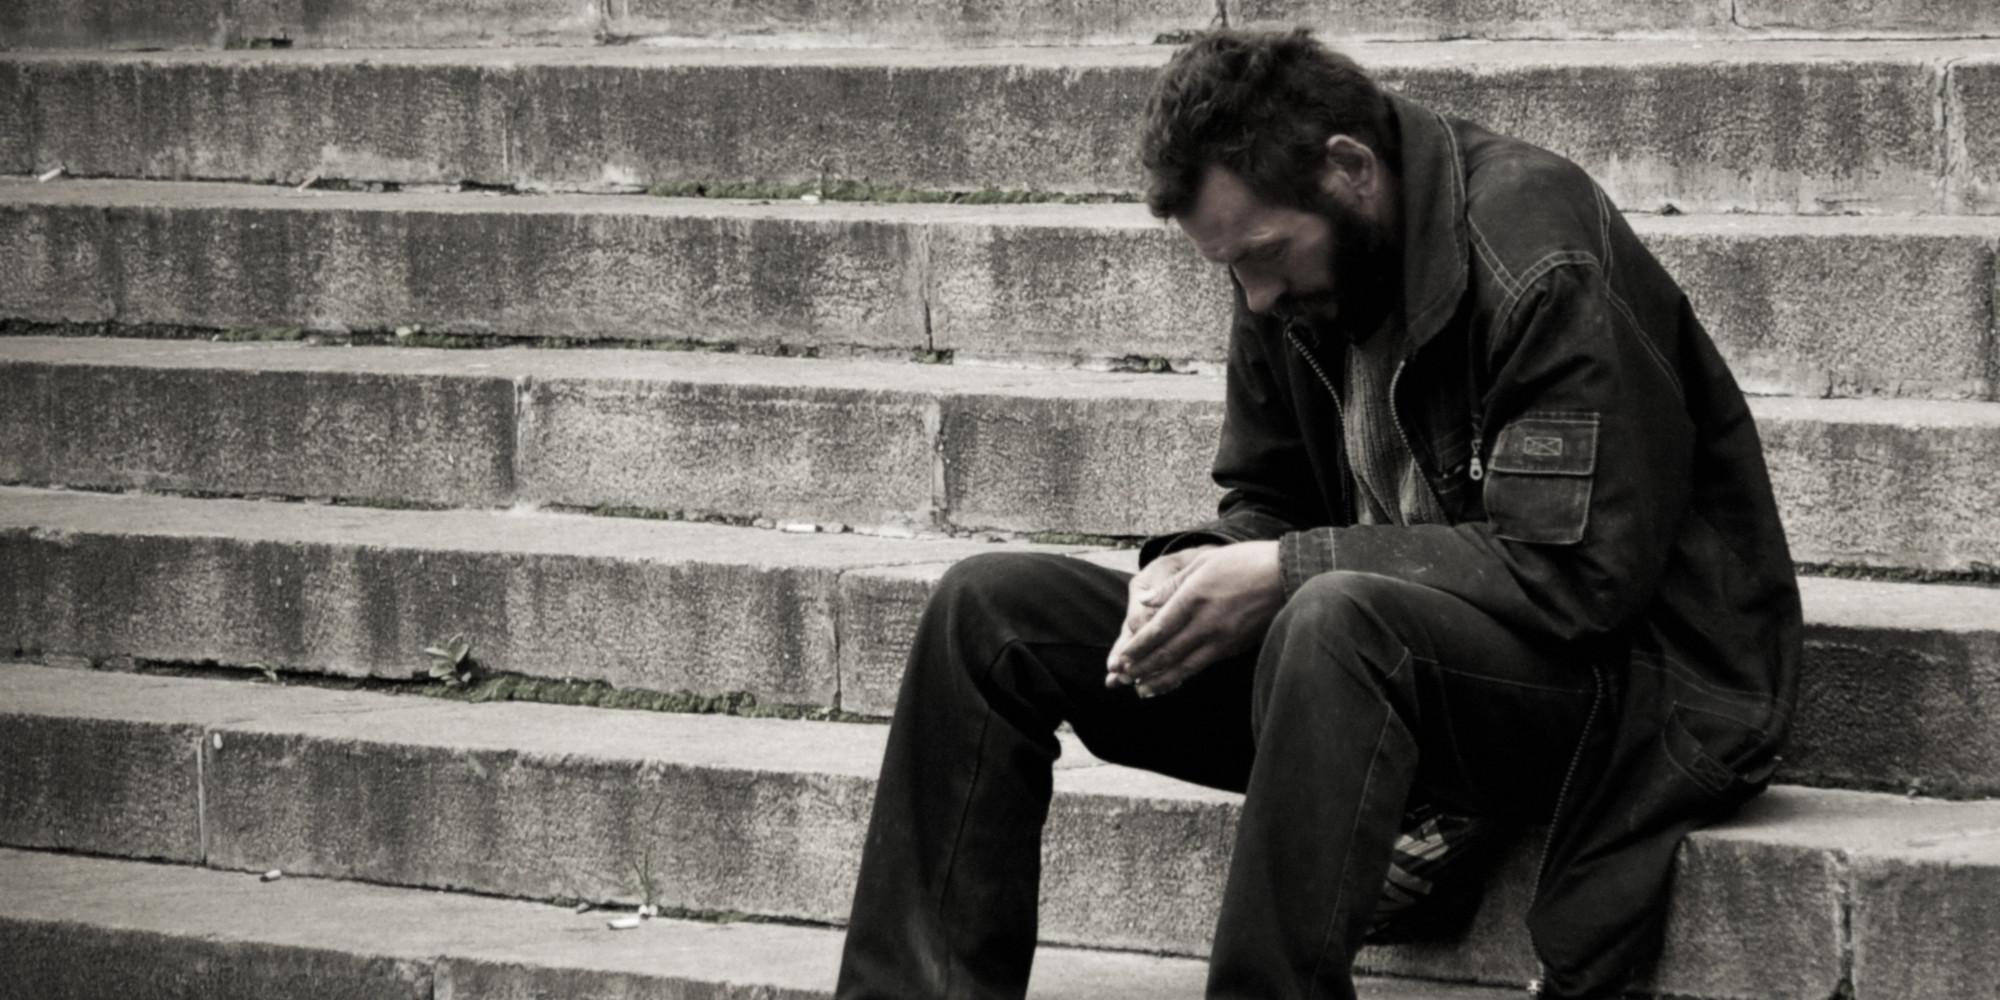 homeless sad poor